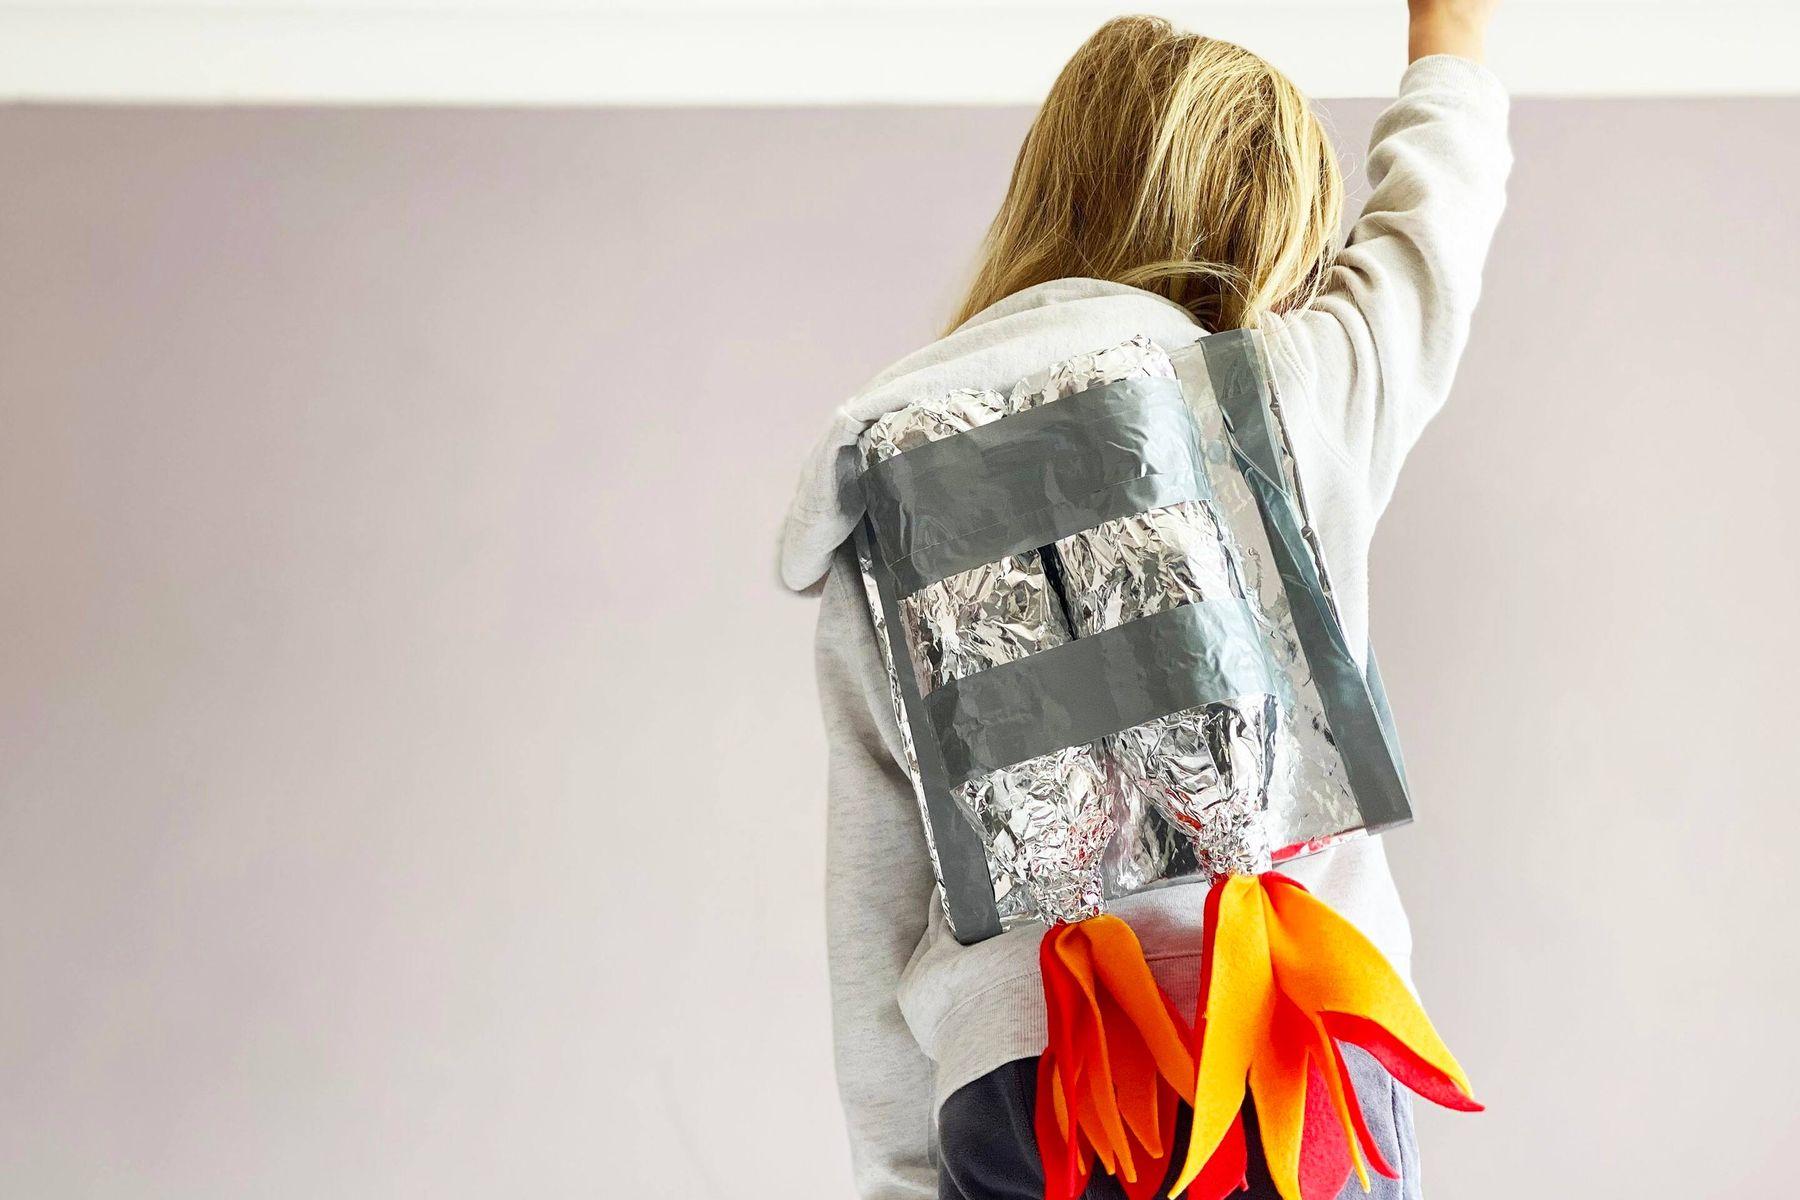 A plastic bottle jet pack